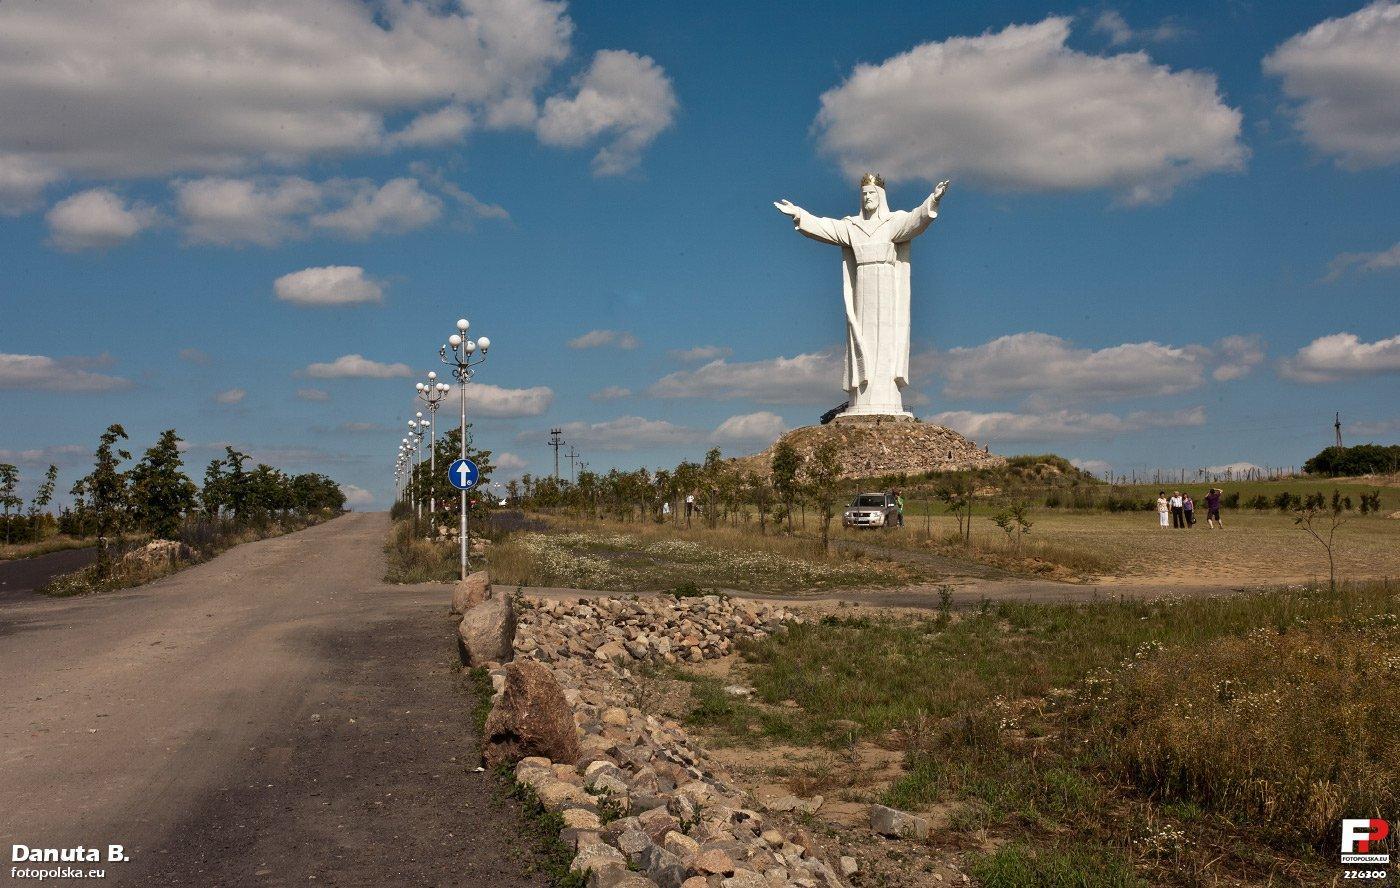 Filewiebodzin Pomnik Chrystusa Krla Fotopolskaeu